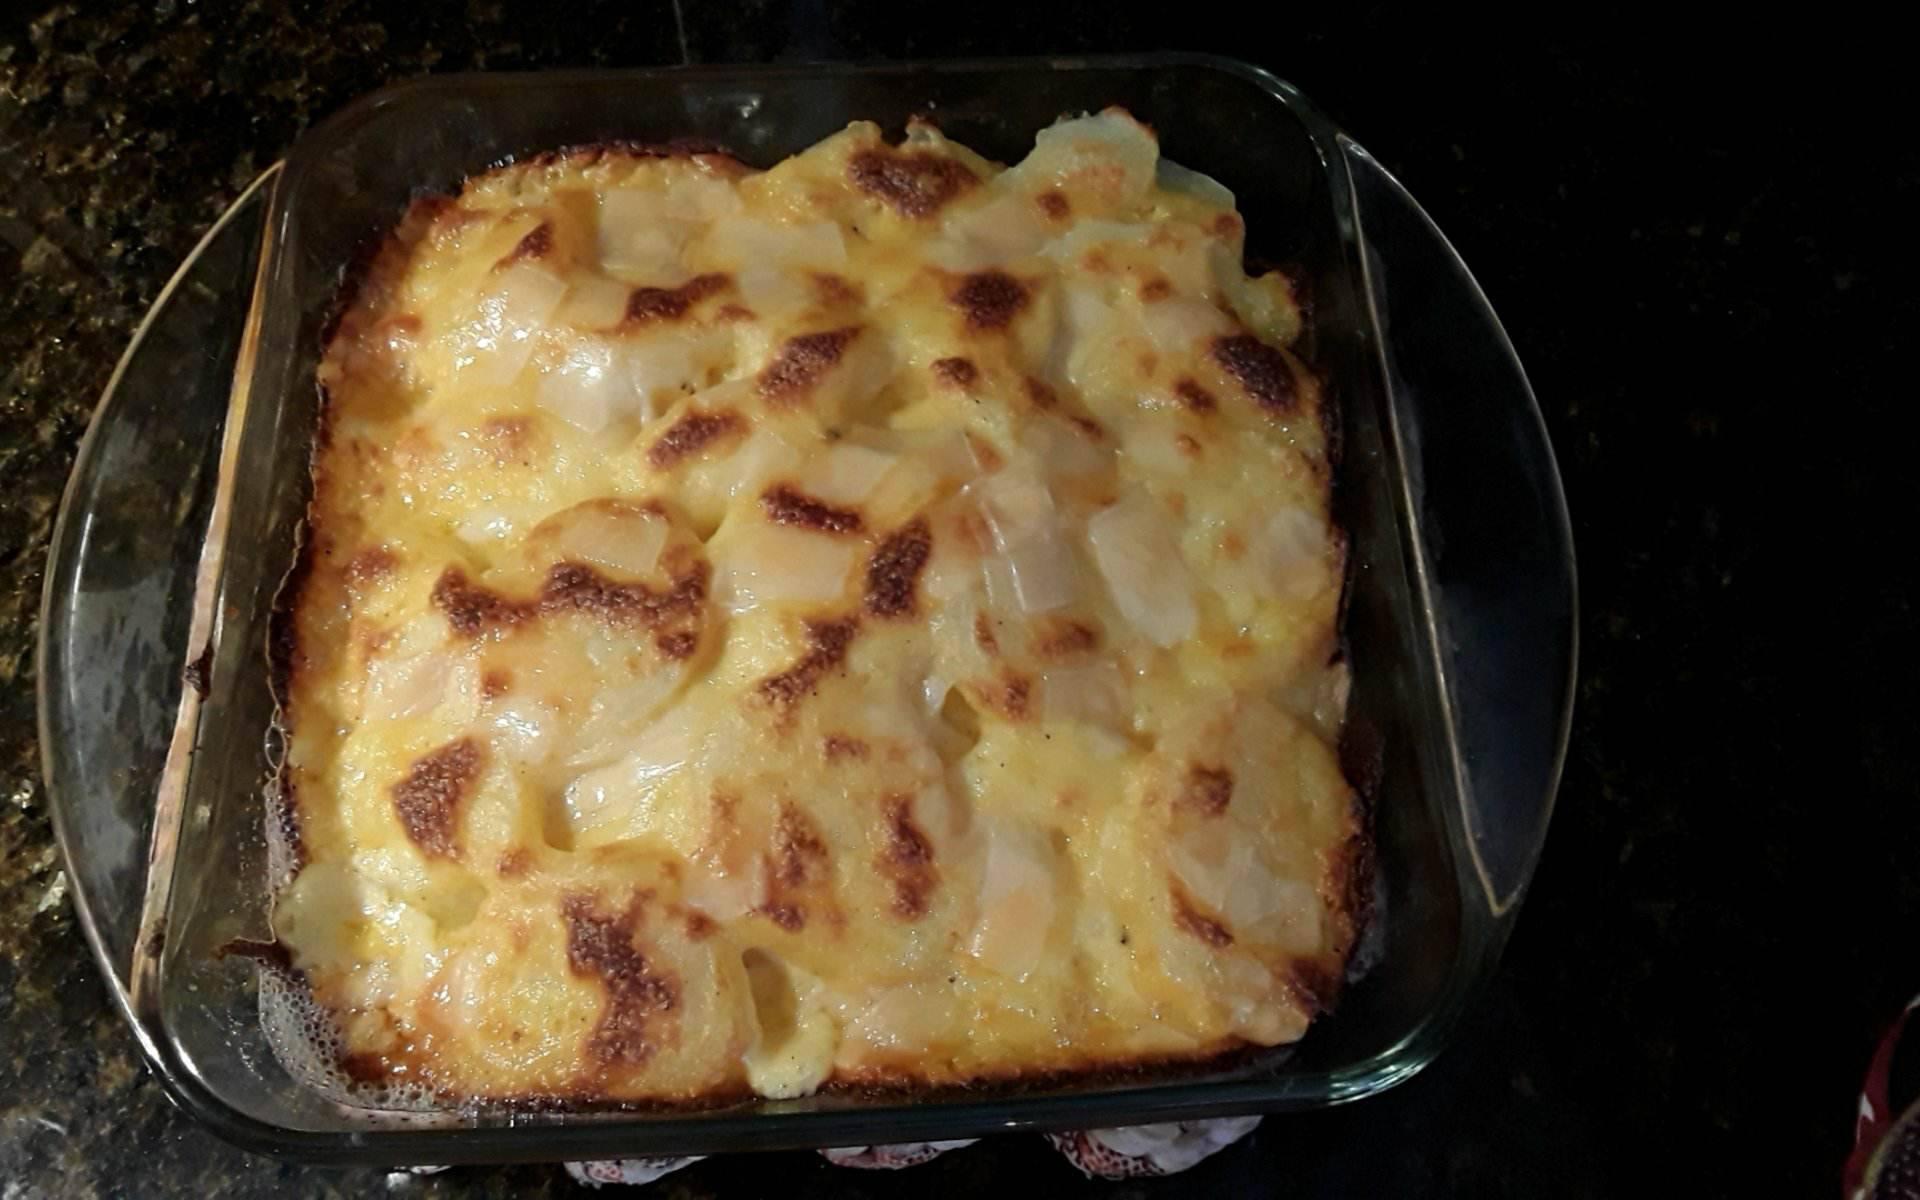 Parmesan-Crusted Au Gratin Potatoes and Onion WNC Chip